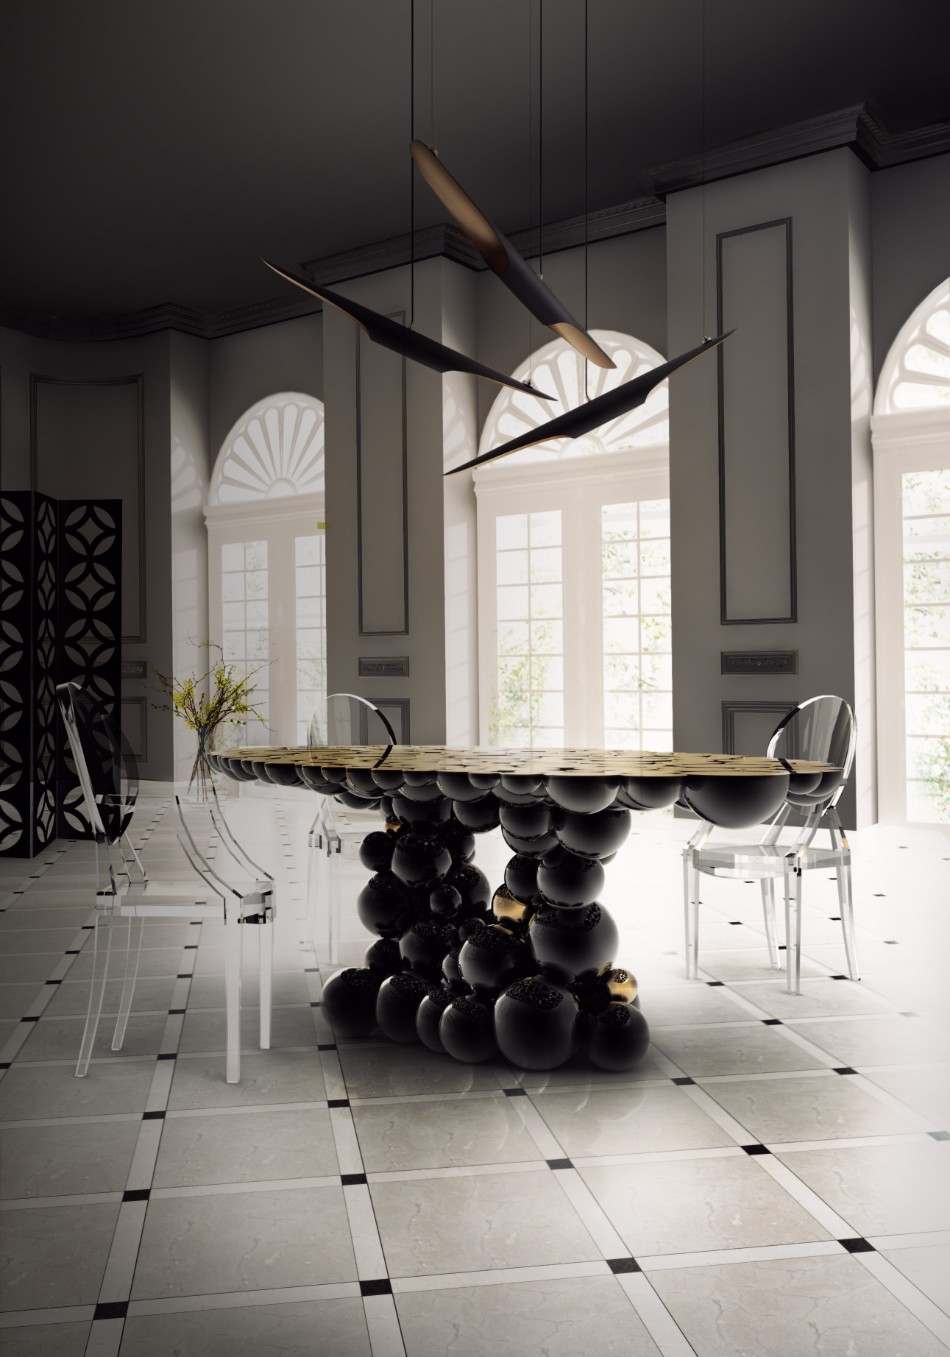 design ideas 50 Home Design Ideas For Modern Interiors boca do lobo newton